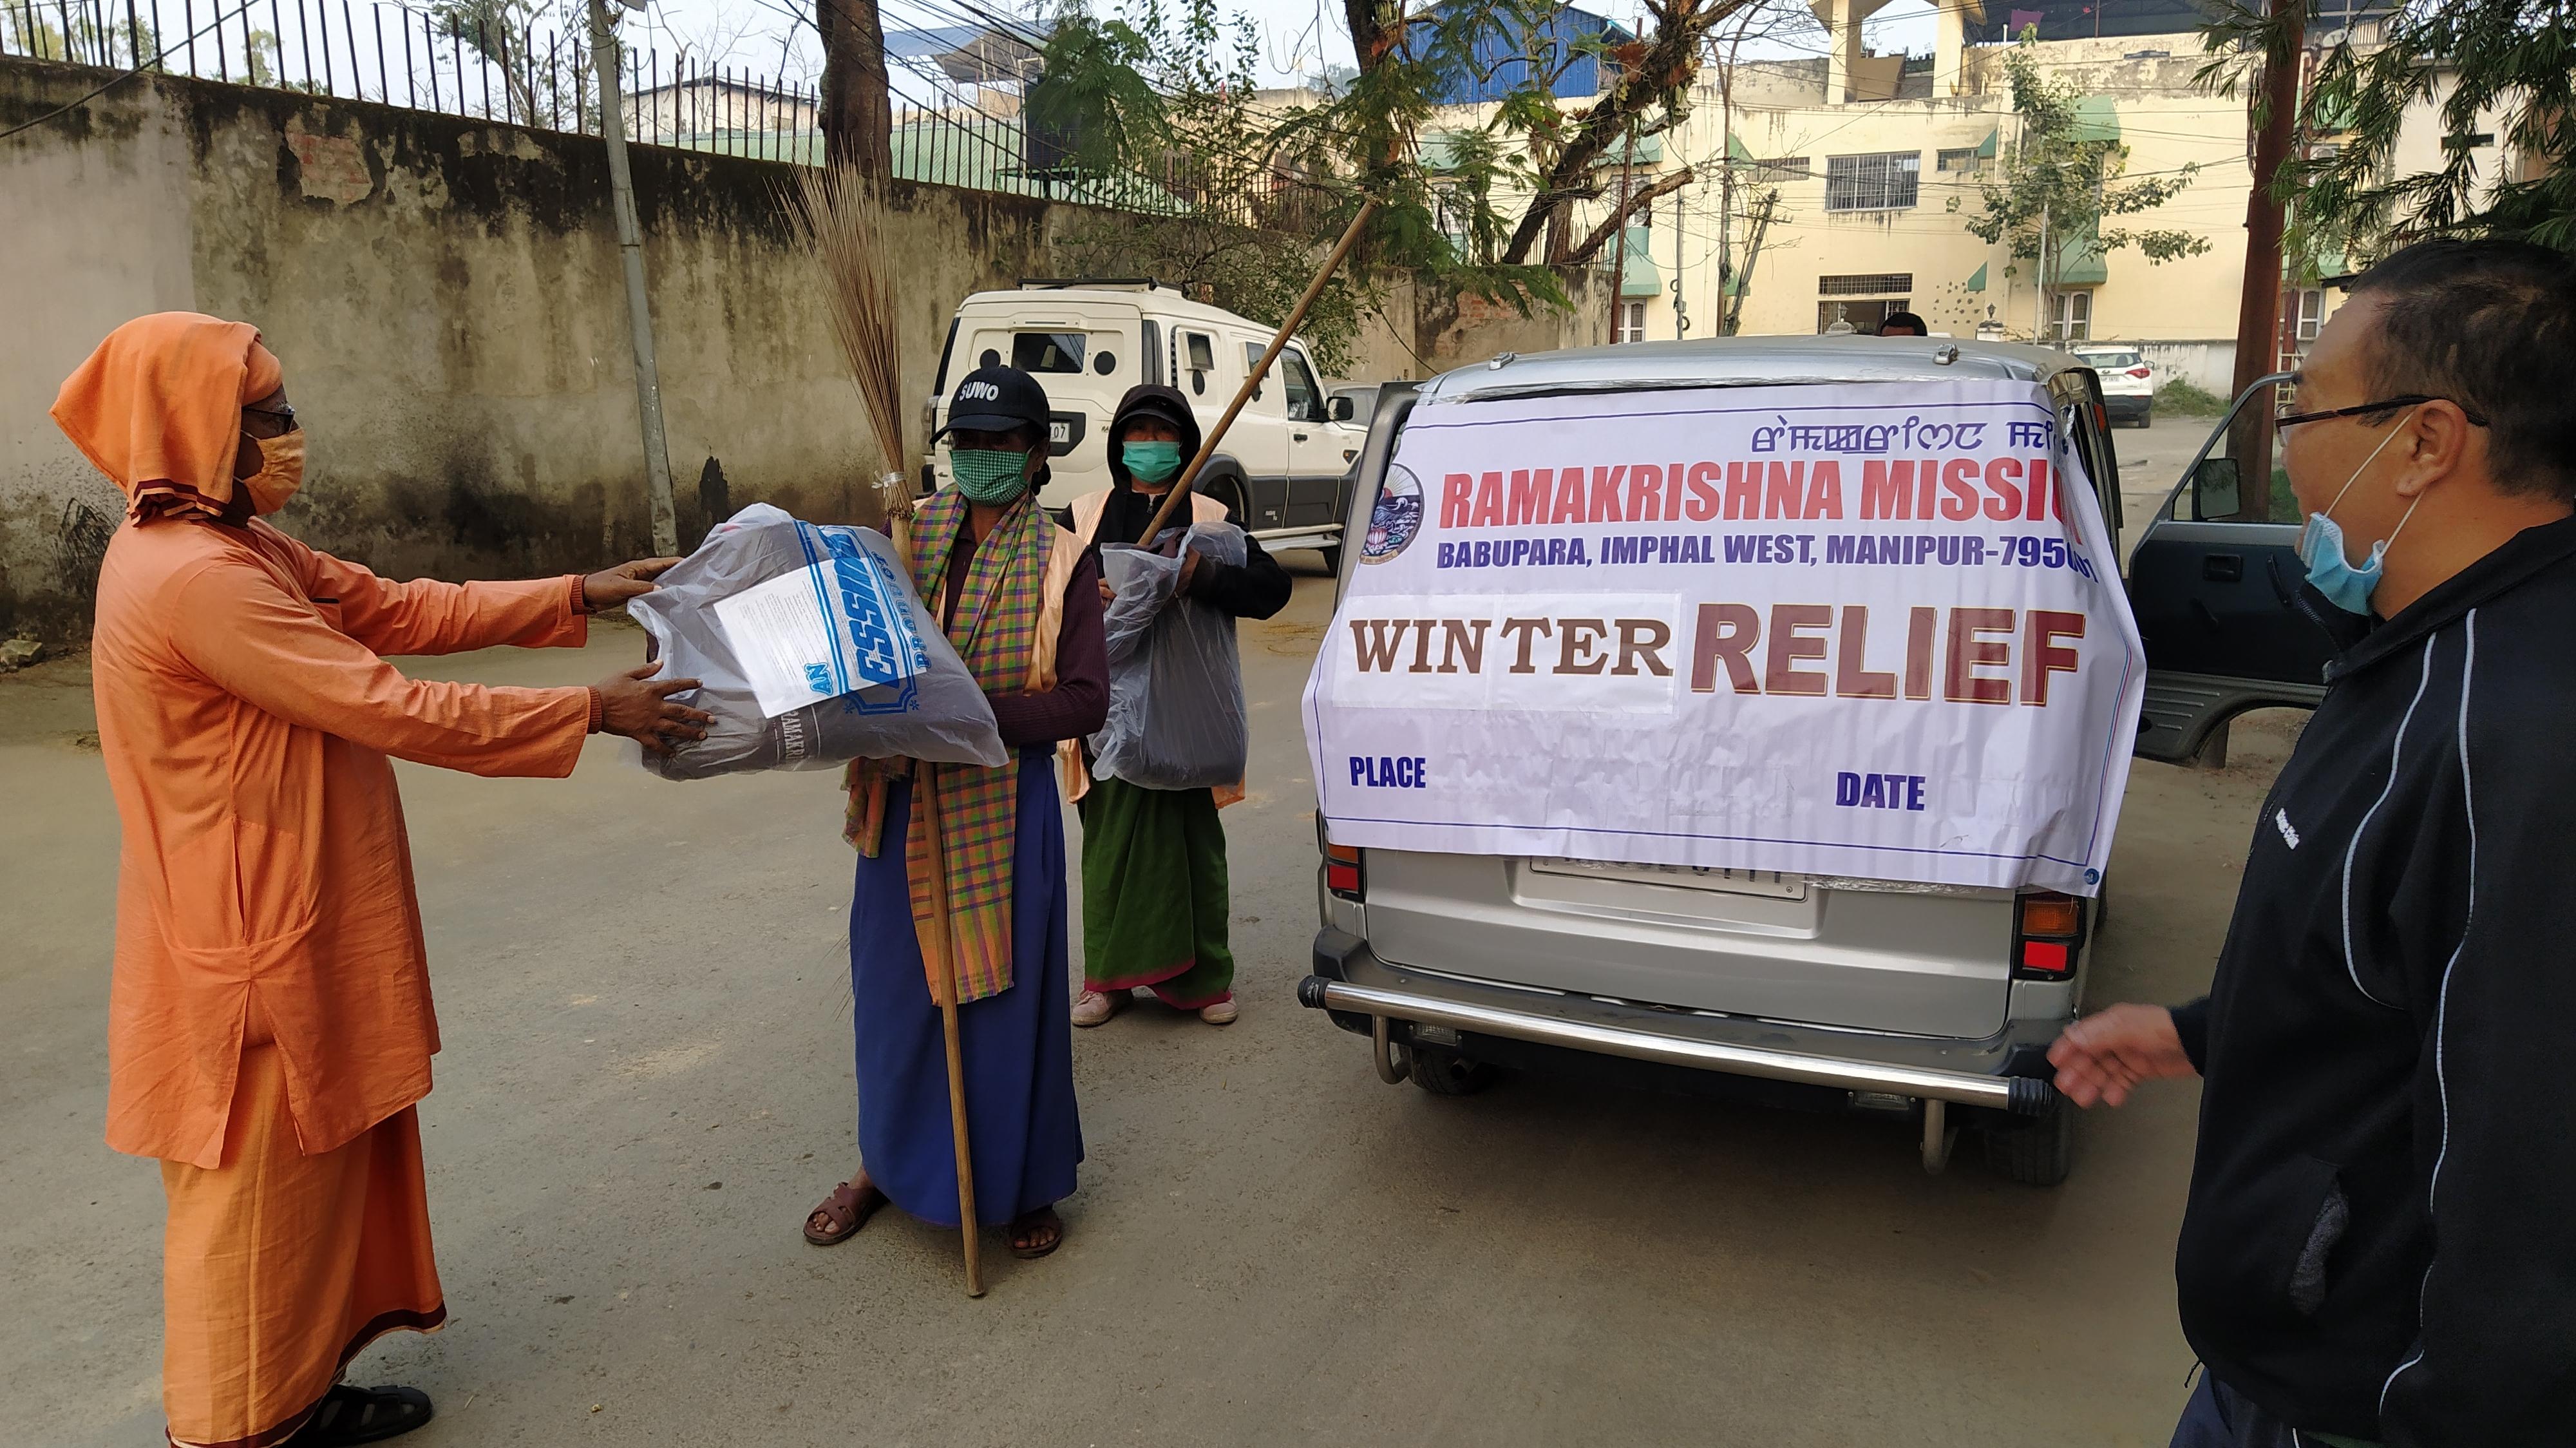 Winter Relief Sanitation 22.11.2020 (6)